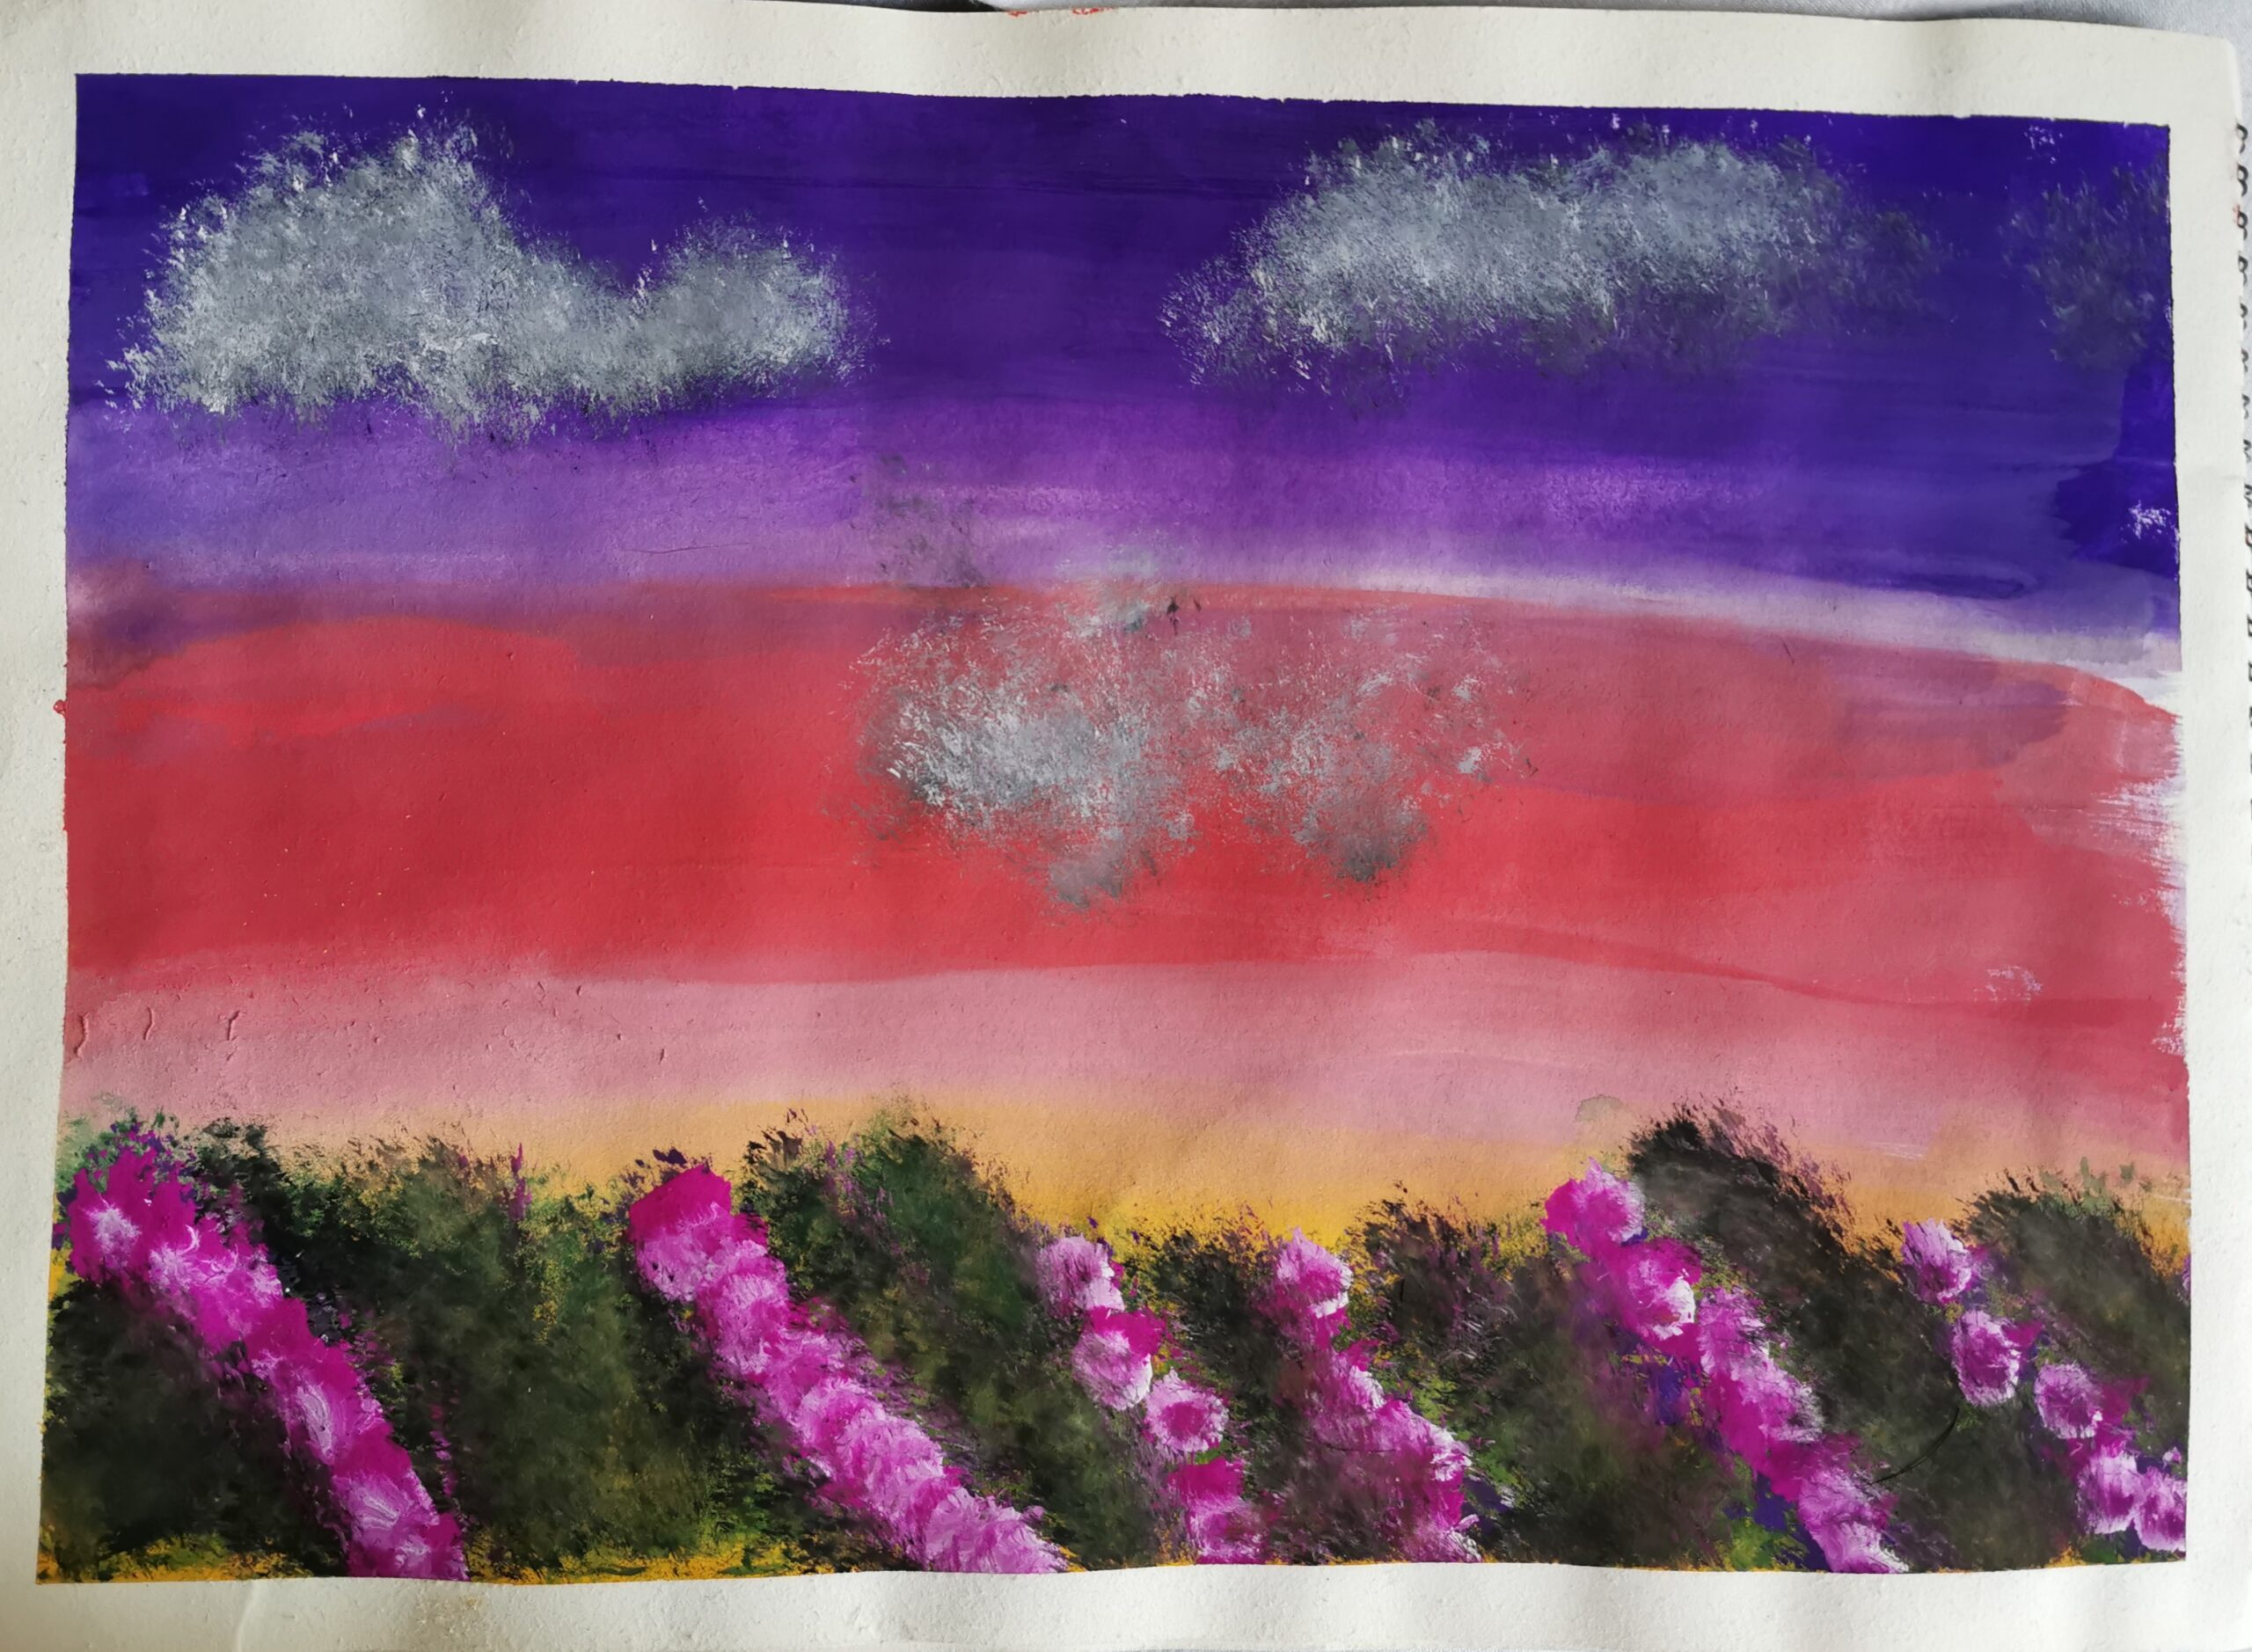 Twilight Blooms at Miracle Gardenby Kyler Dias